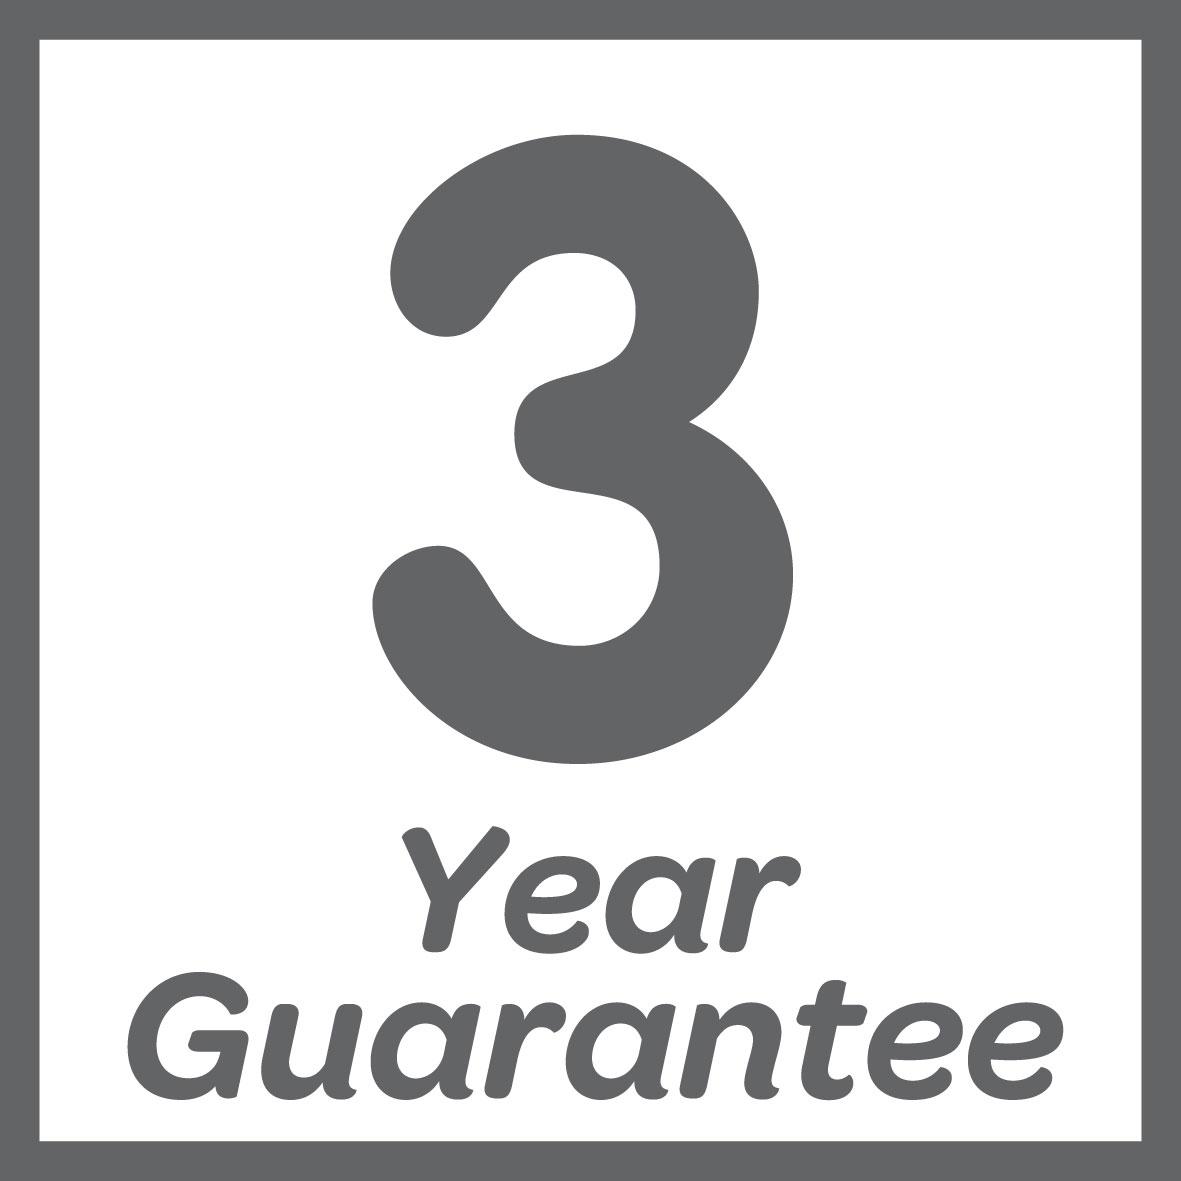 Guaranteed for 3 years